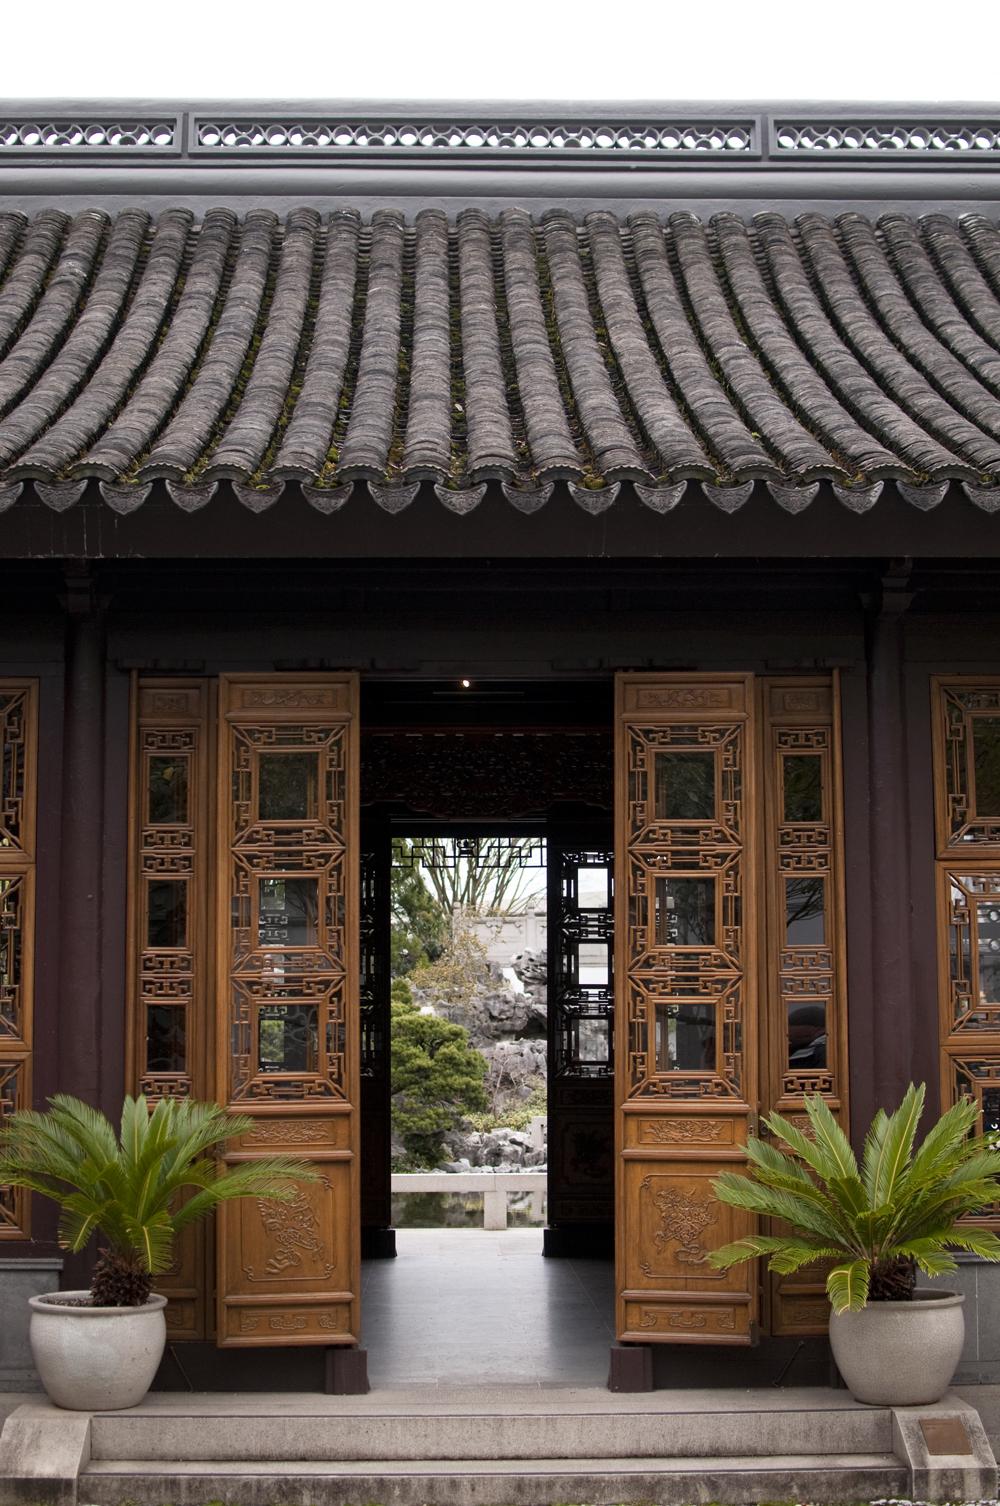 lan-su-garden-portland-oregon-10.jpg